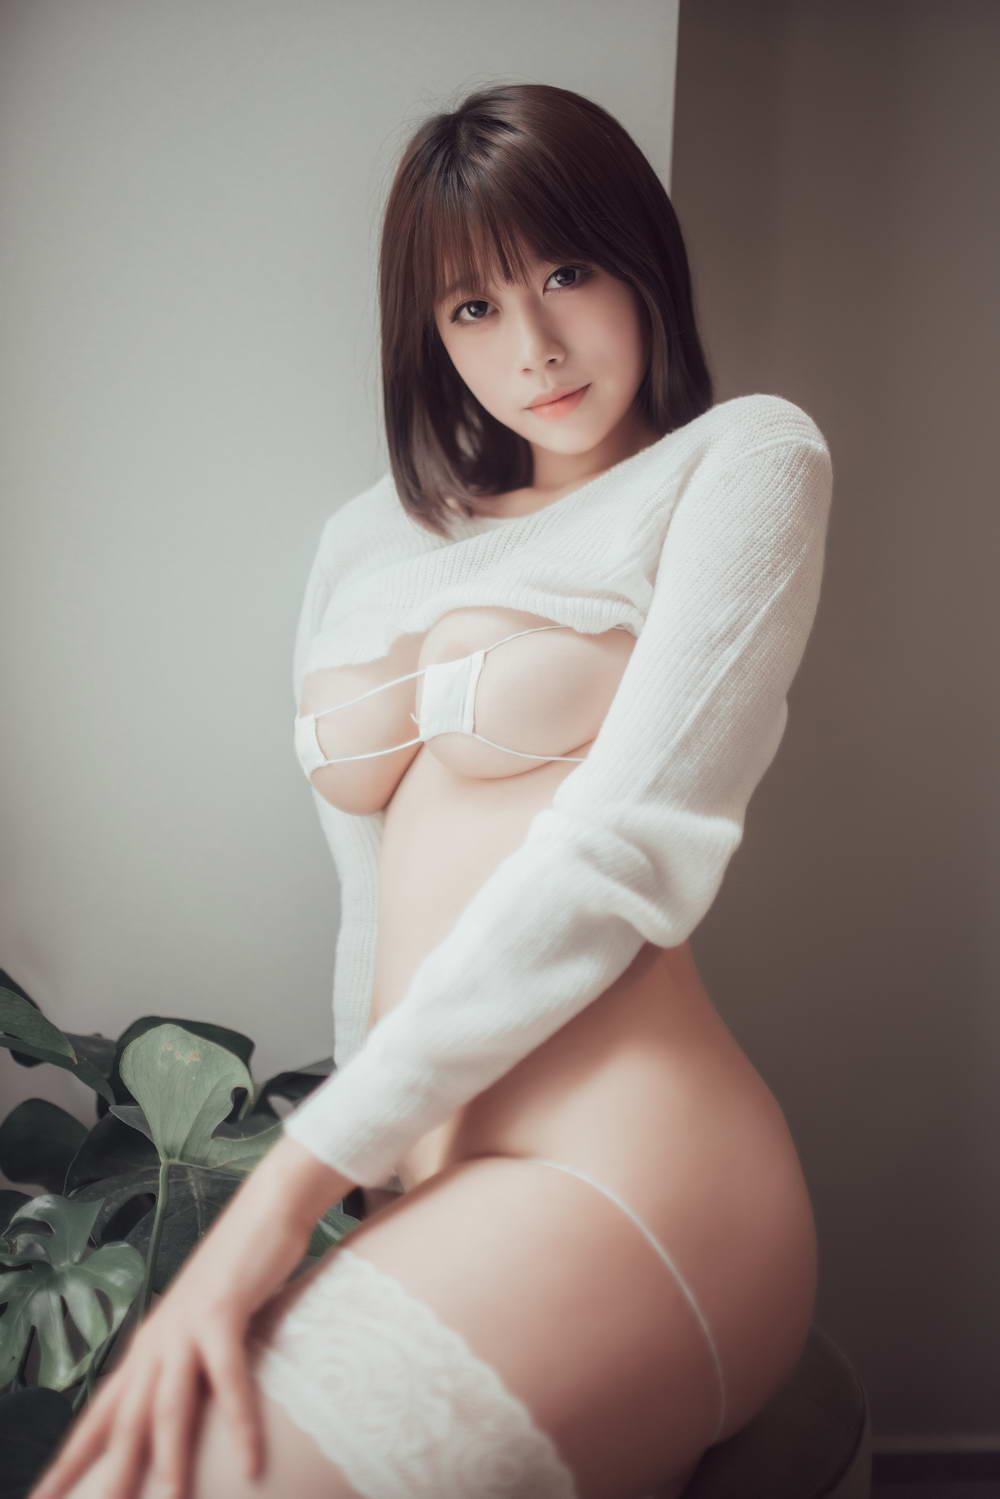 奈汐酱nice – 超小BJN [/324MB]